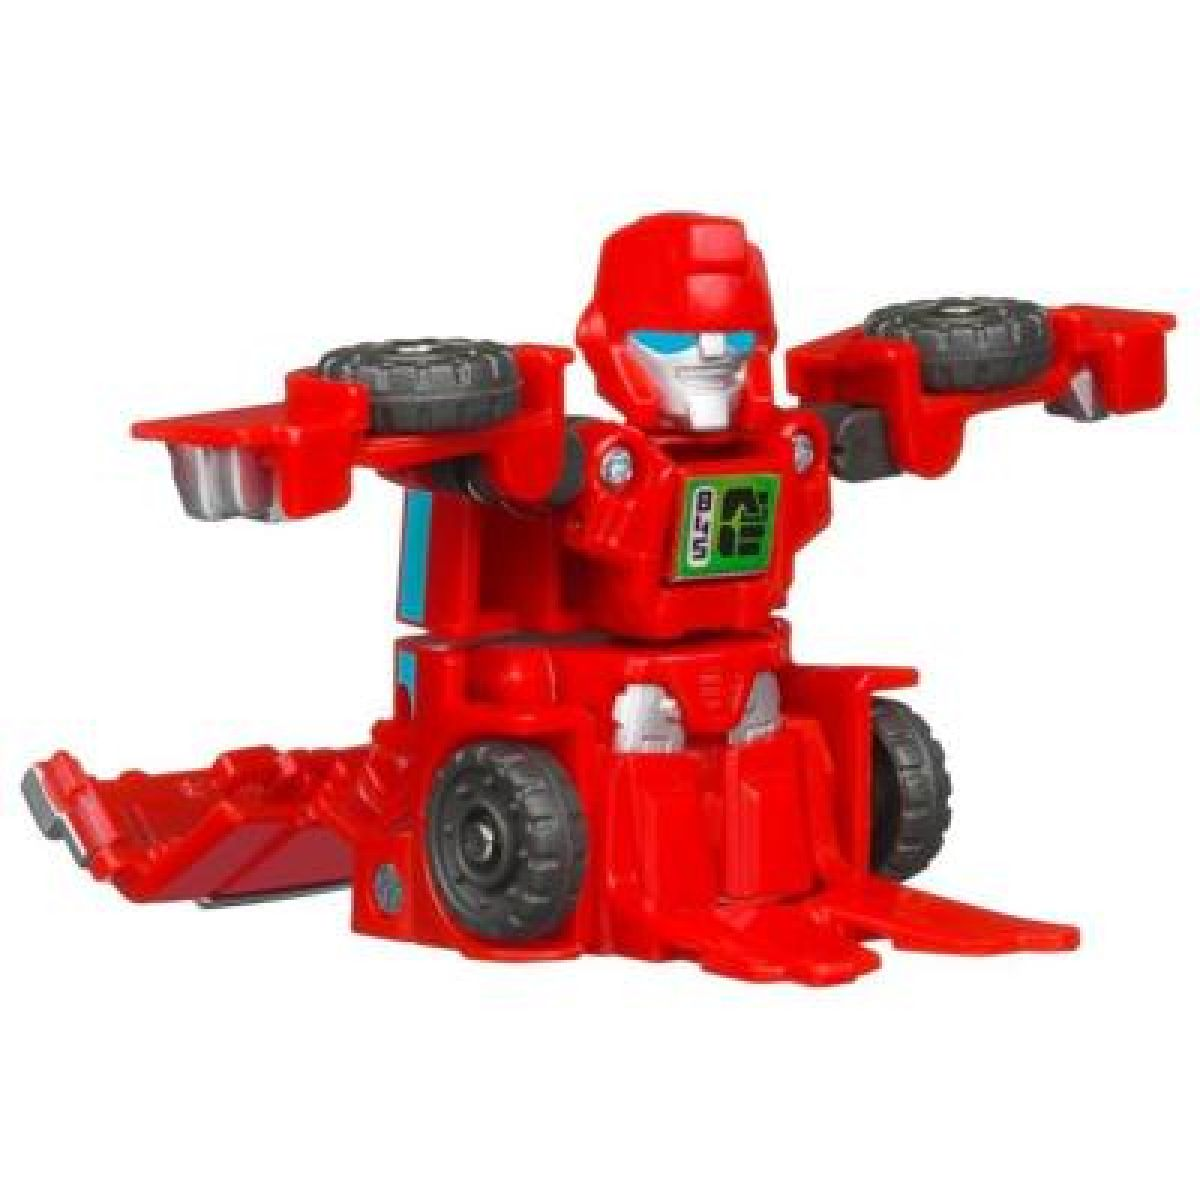 Hasbro Transformers Bot Shots - B002 Ironhide